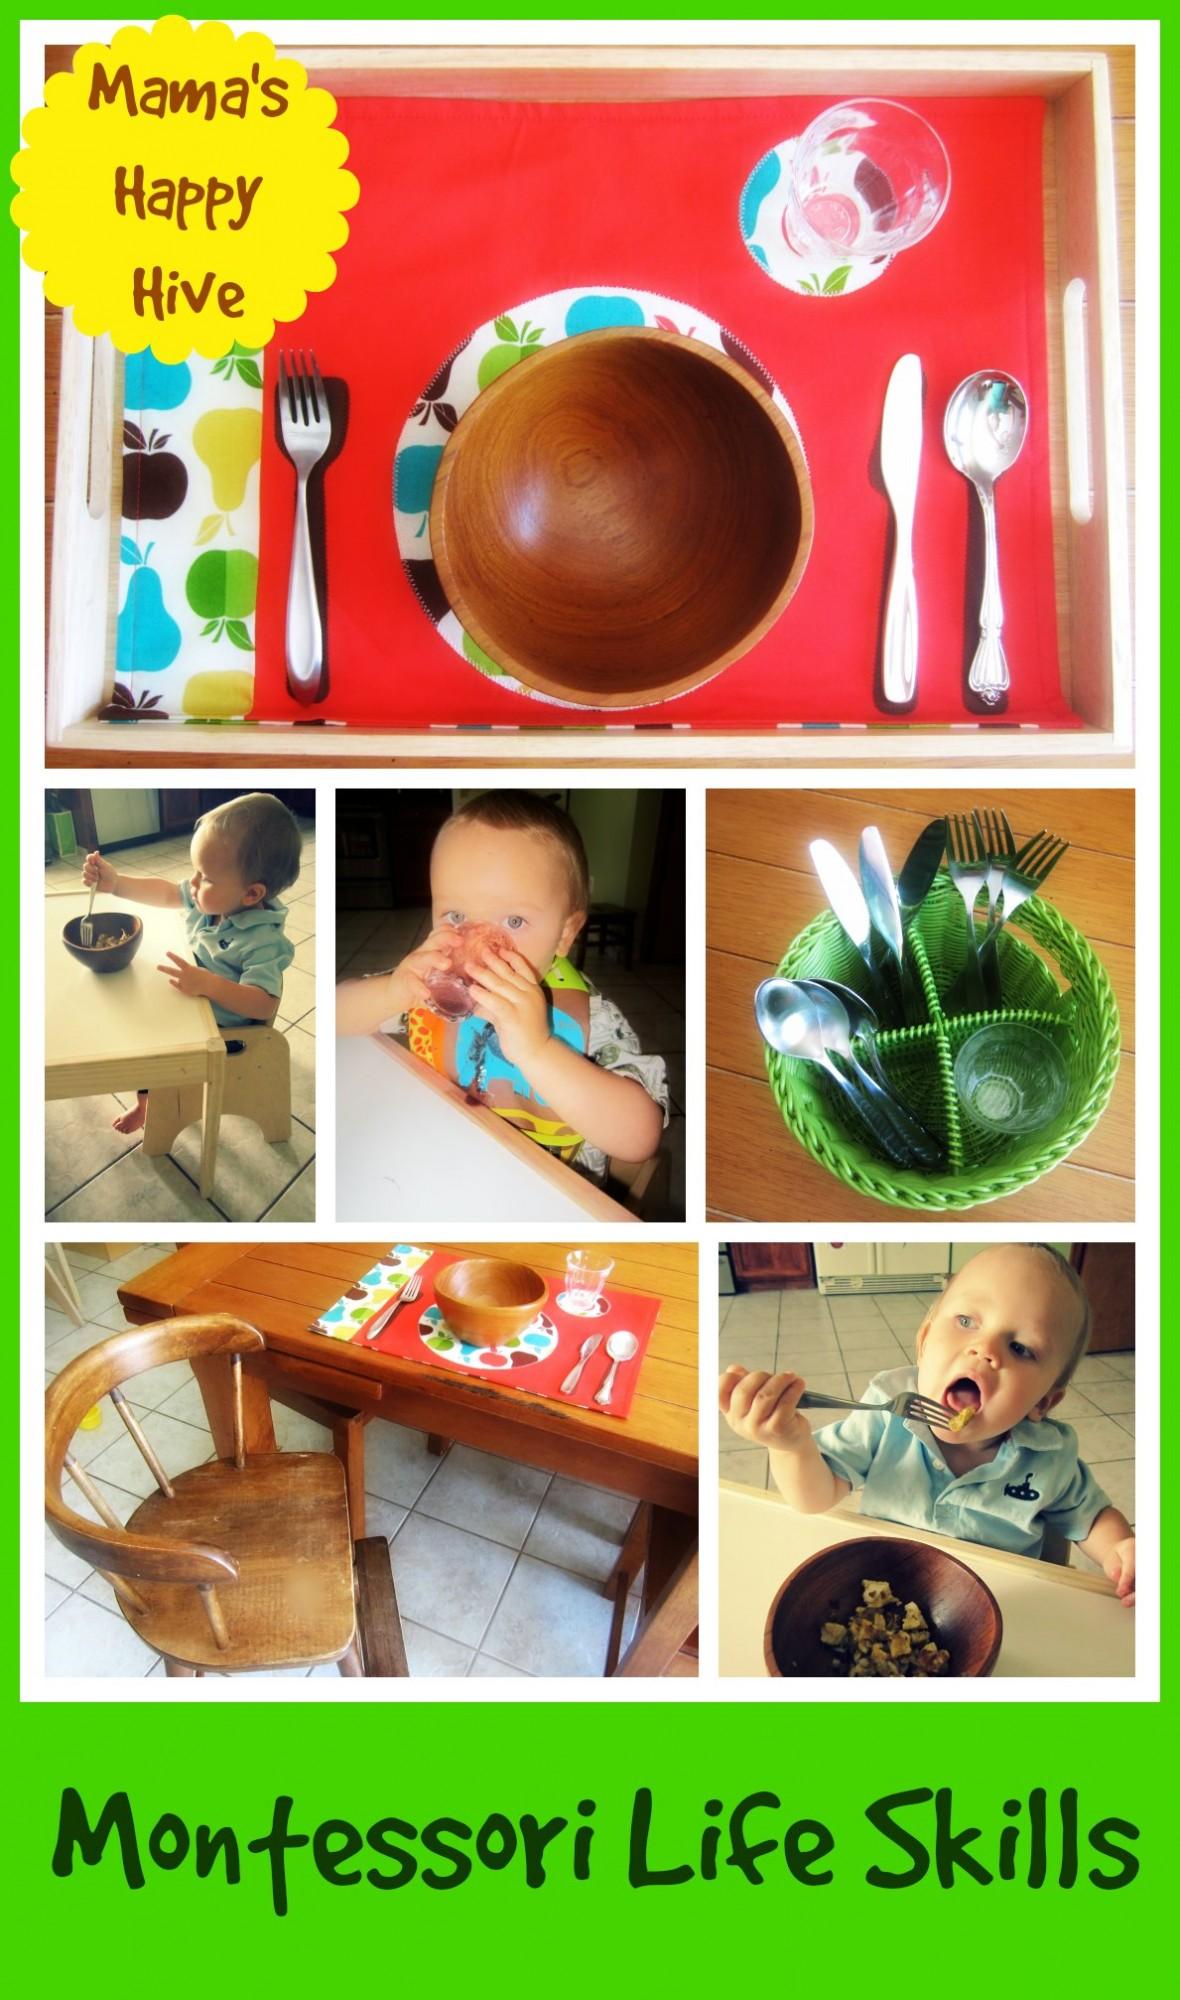 Montessori Life Skills - www.mamashappyhive.com